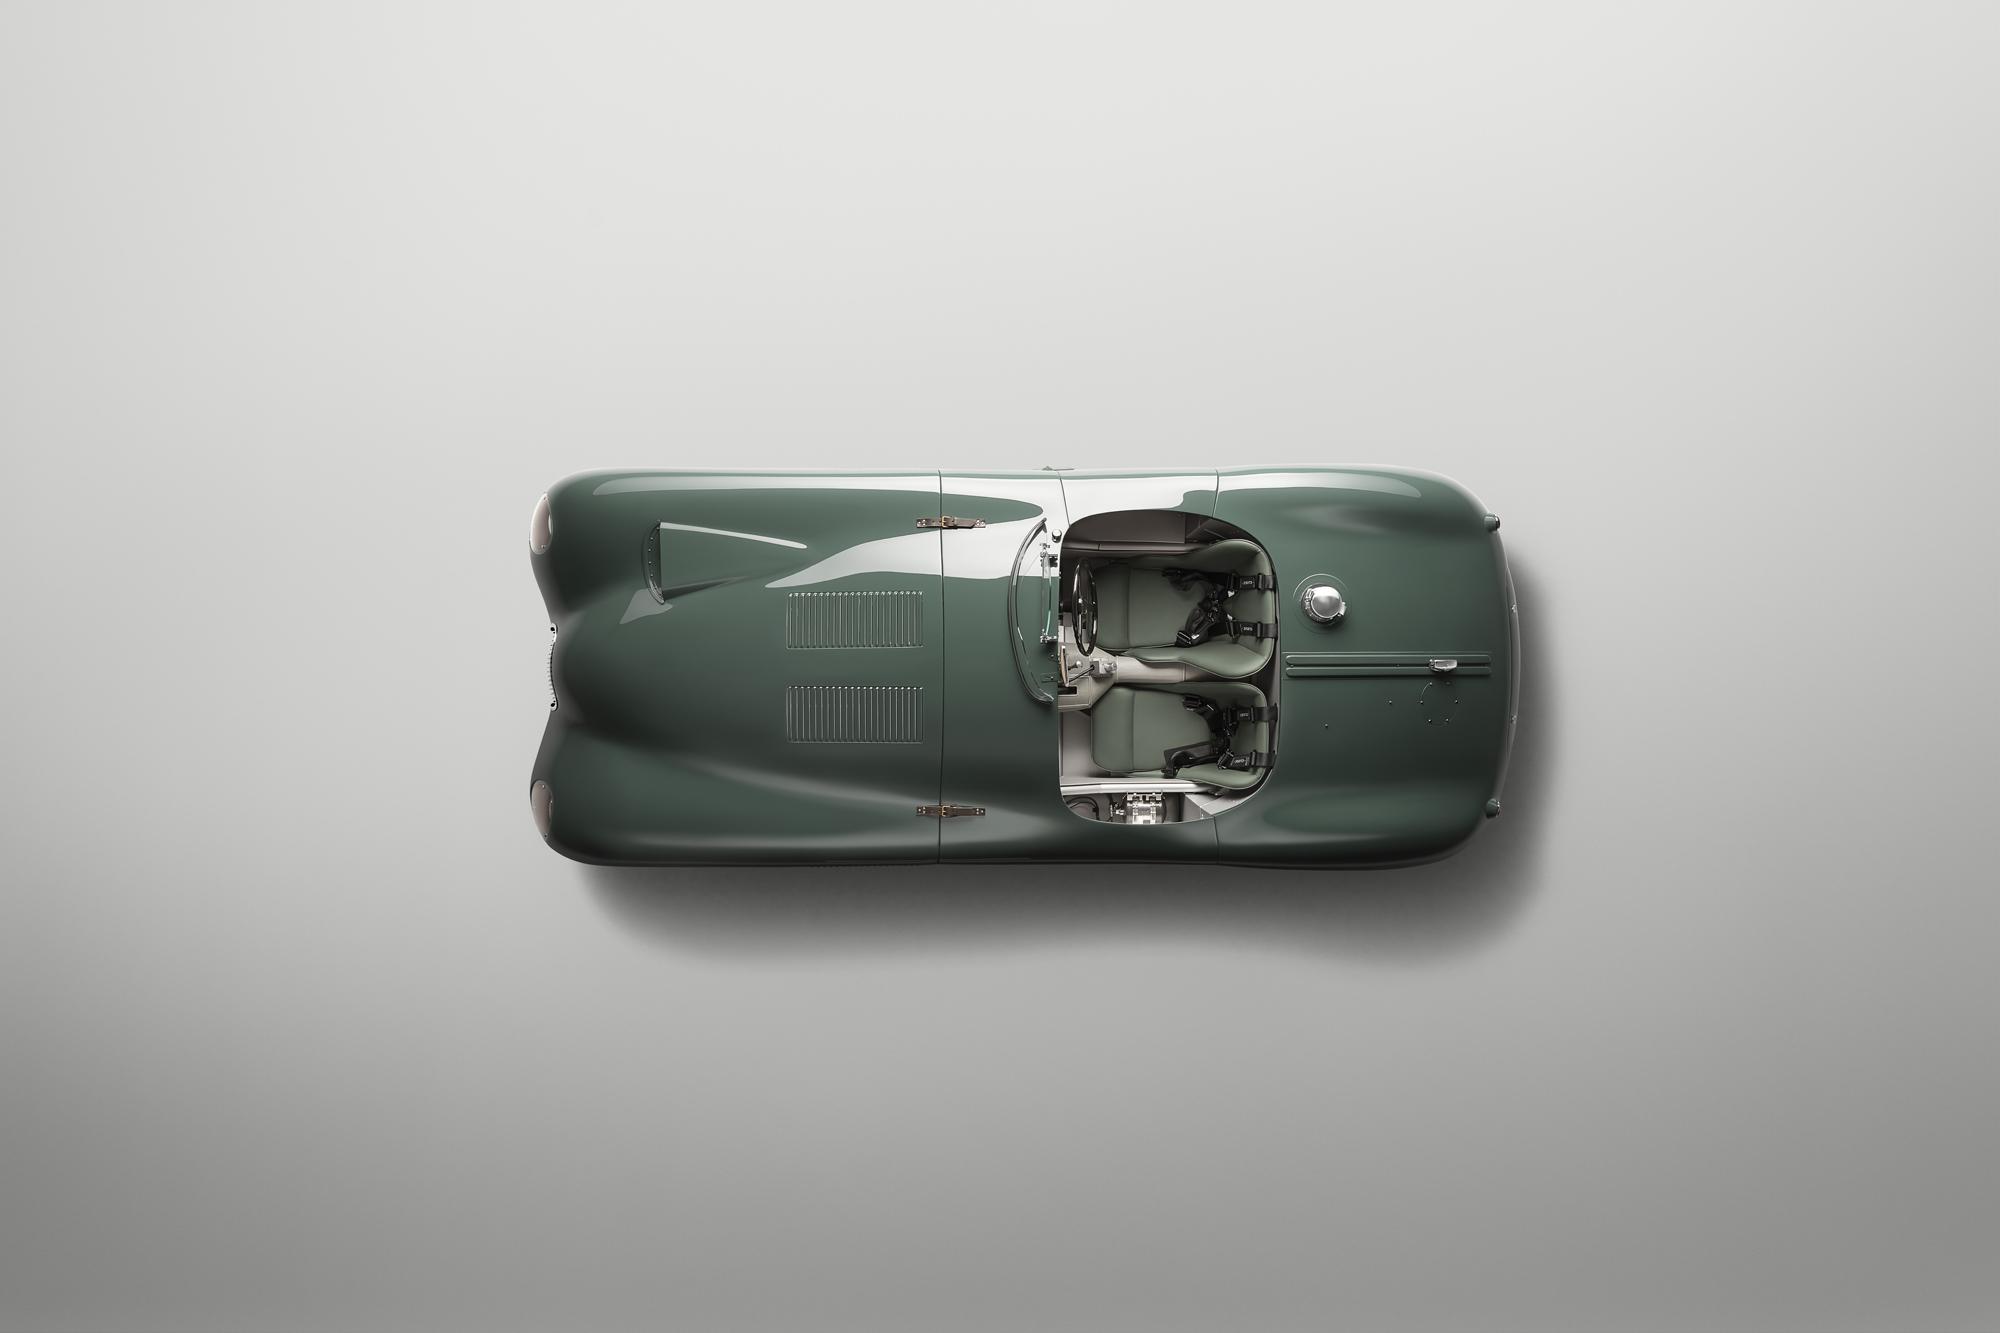 Jaguar C-type continuation top 2